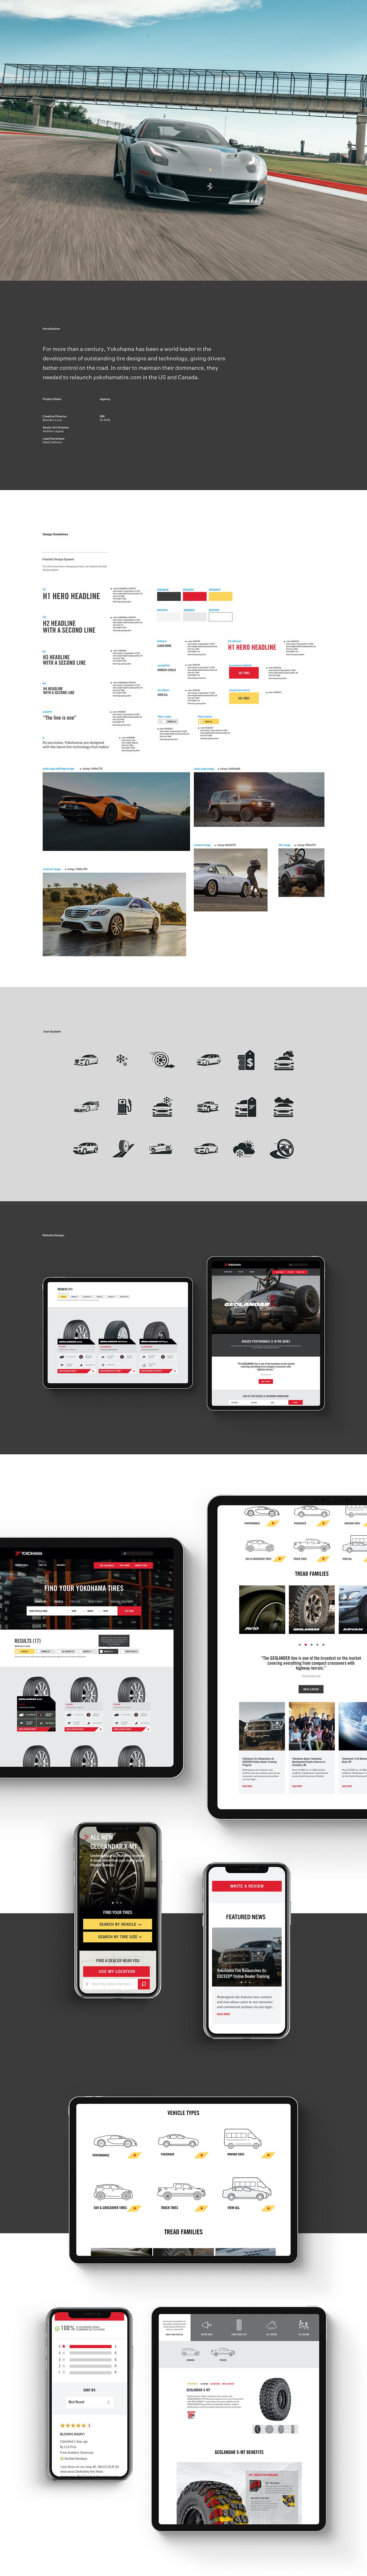 interactive UI ux art direction  graphic design  Web Design  typography   digital design Web product design